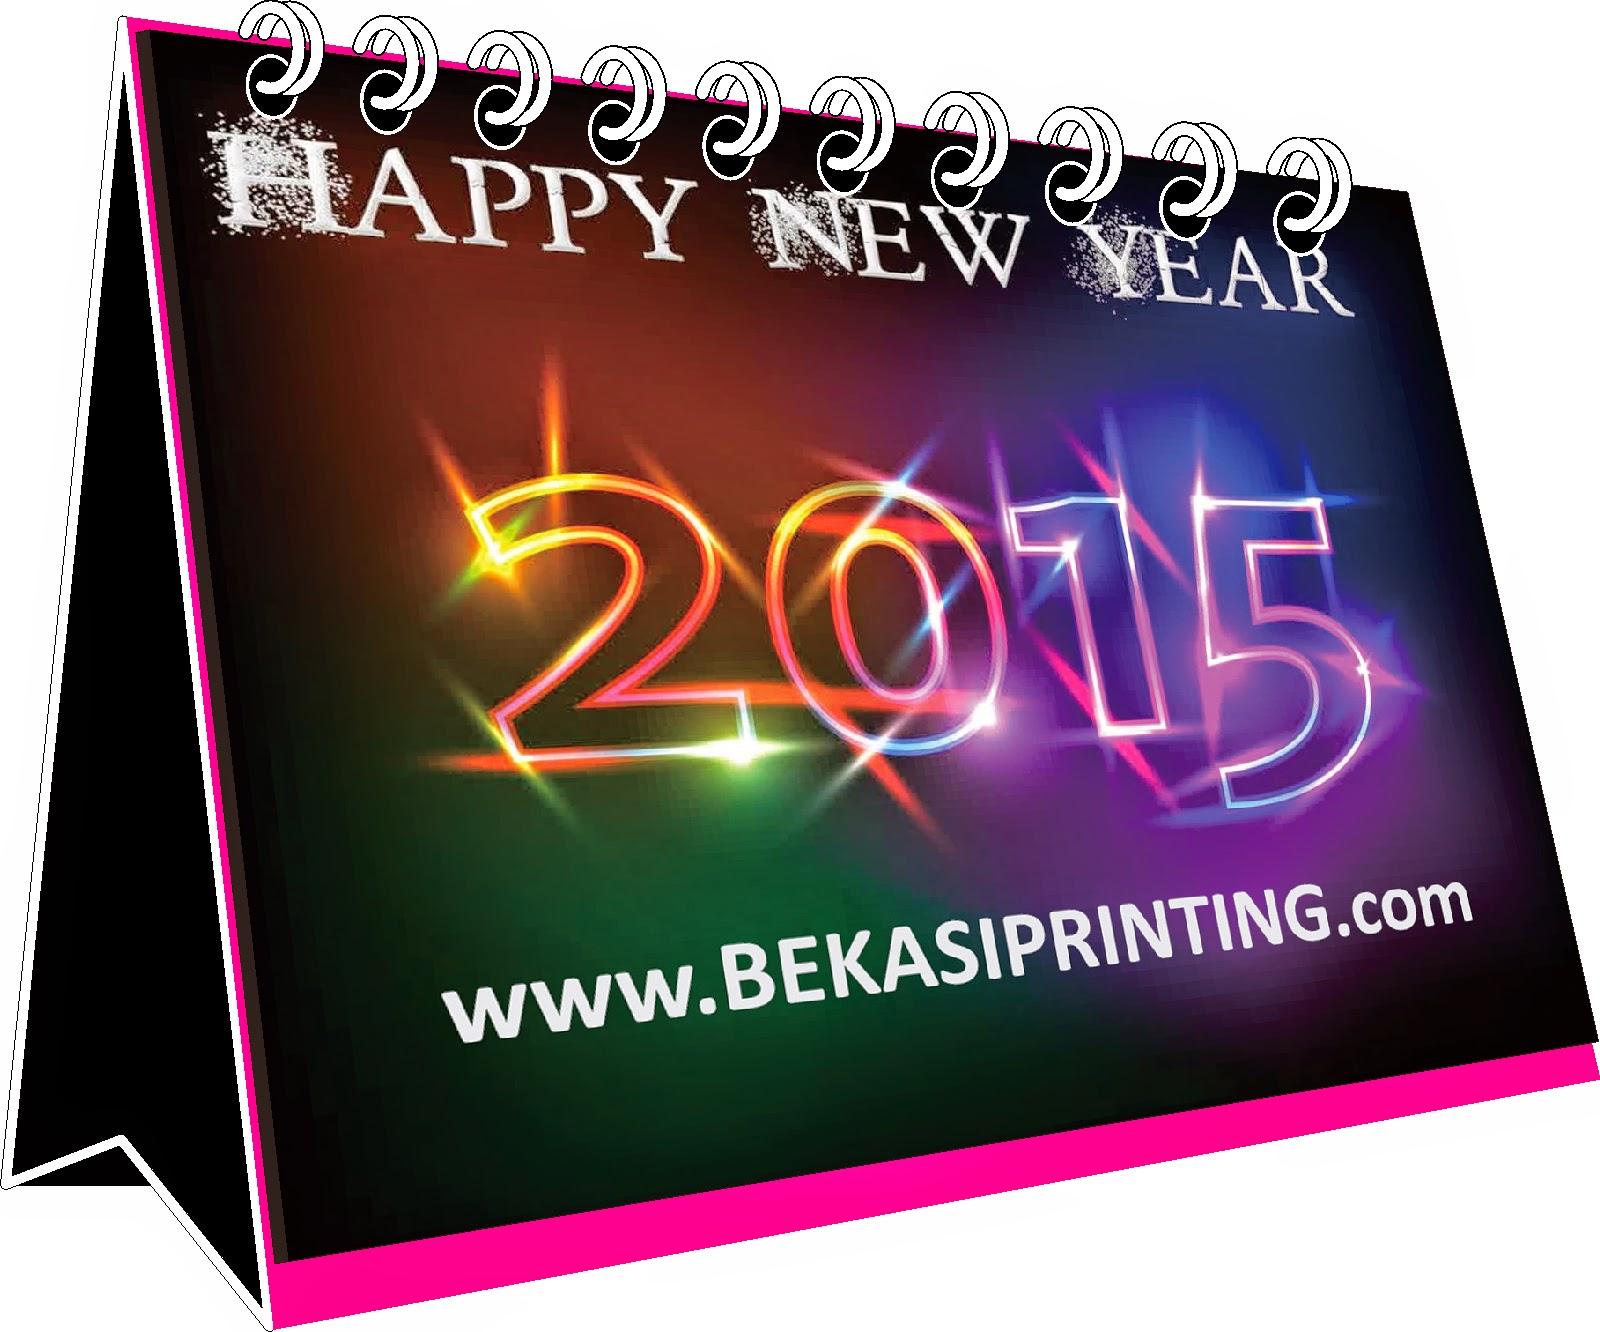 Cetak Kalender Duduk 2015